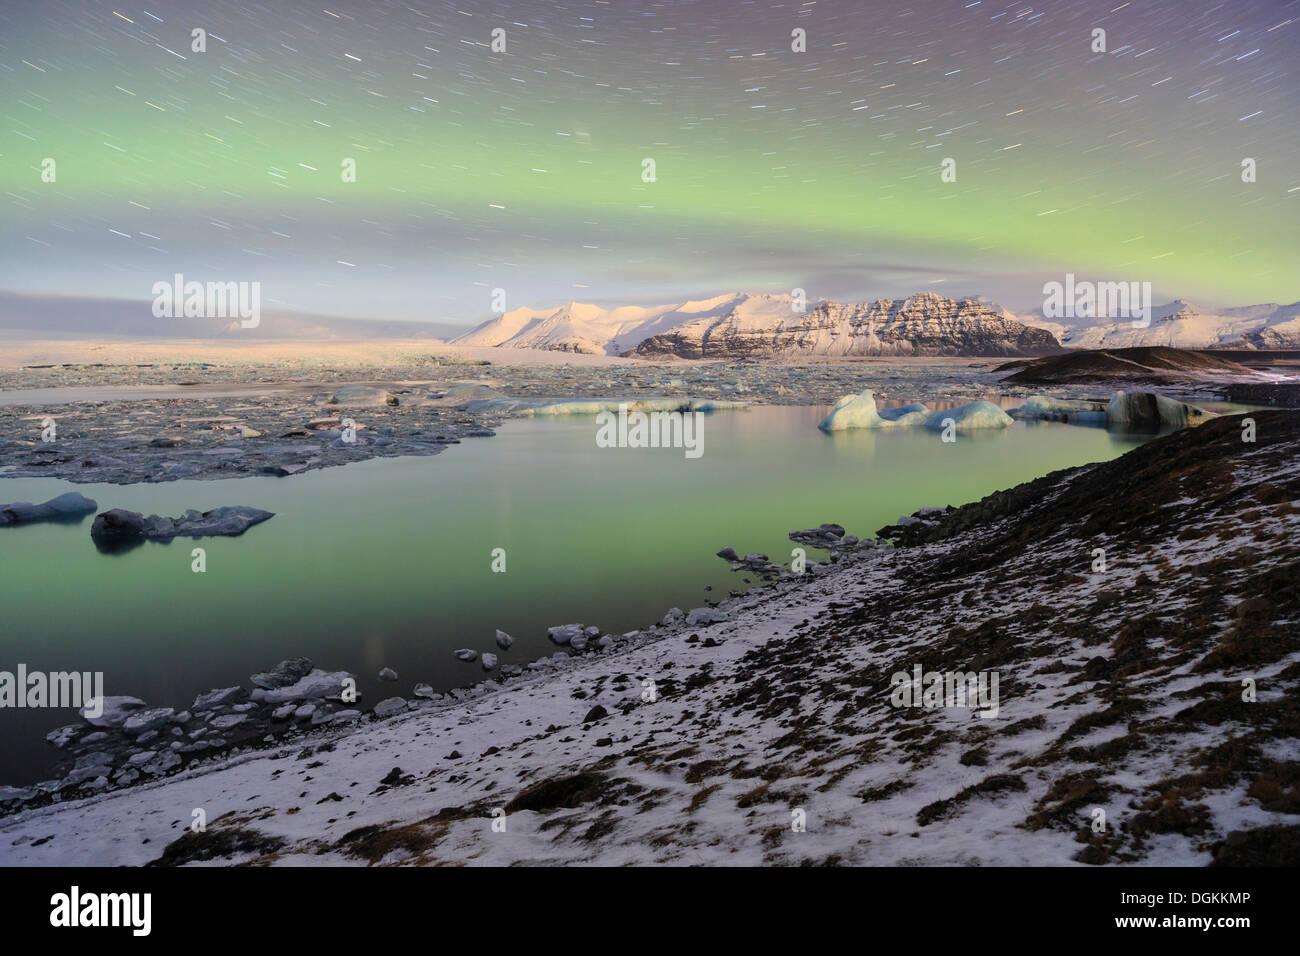 Aurora borealis over the Jokulsarlon Glacier Lagoon in Iceland. - Stock Image